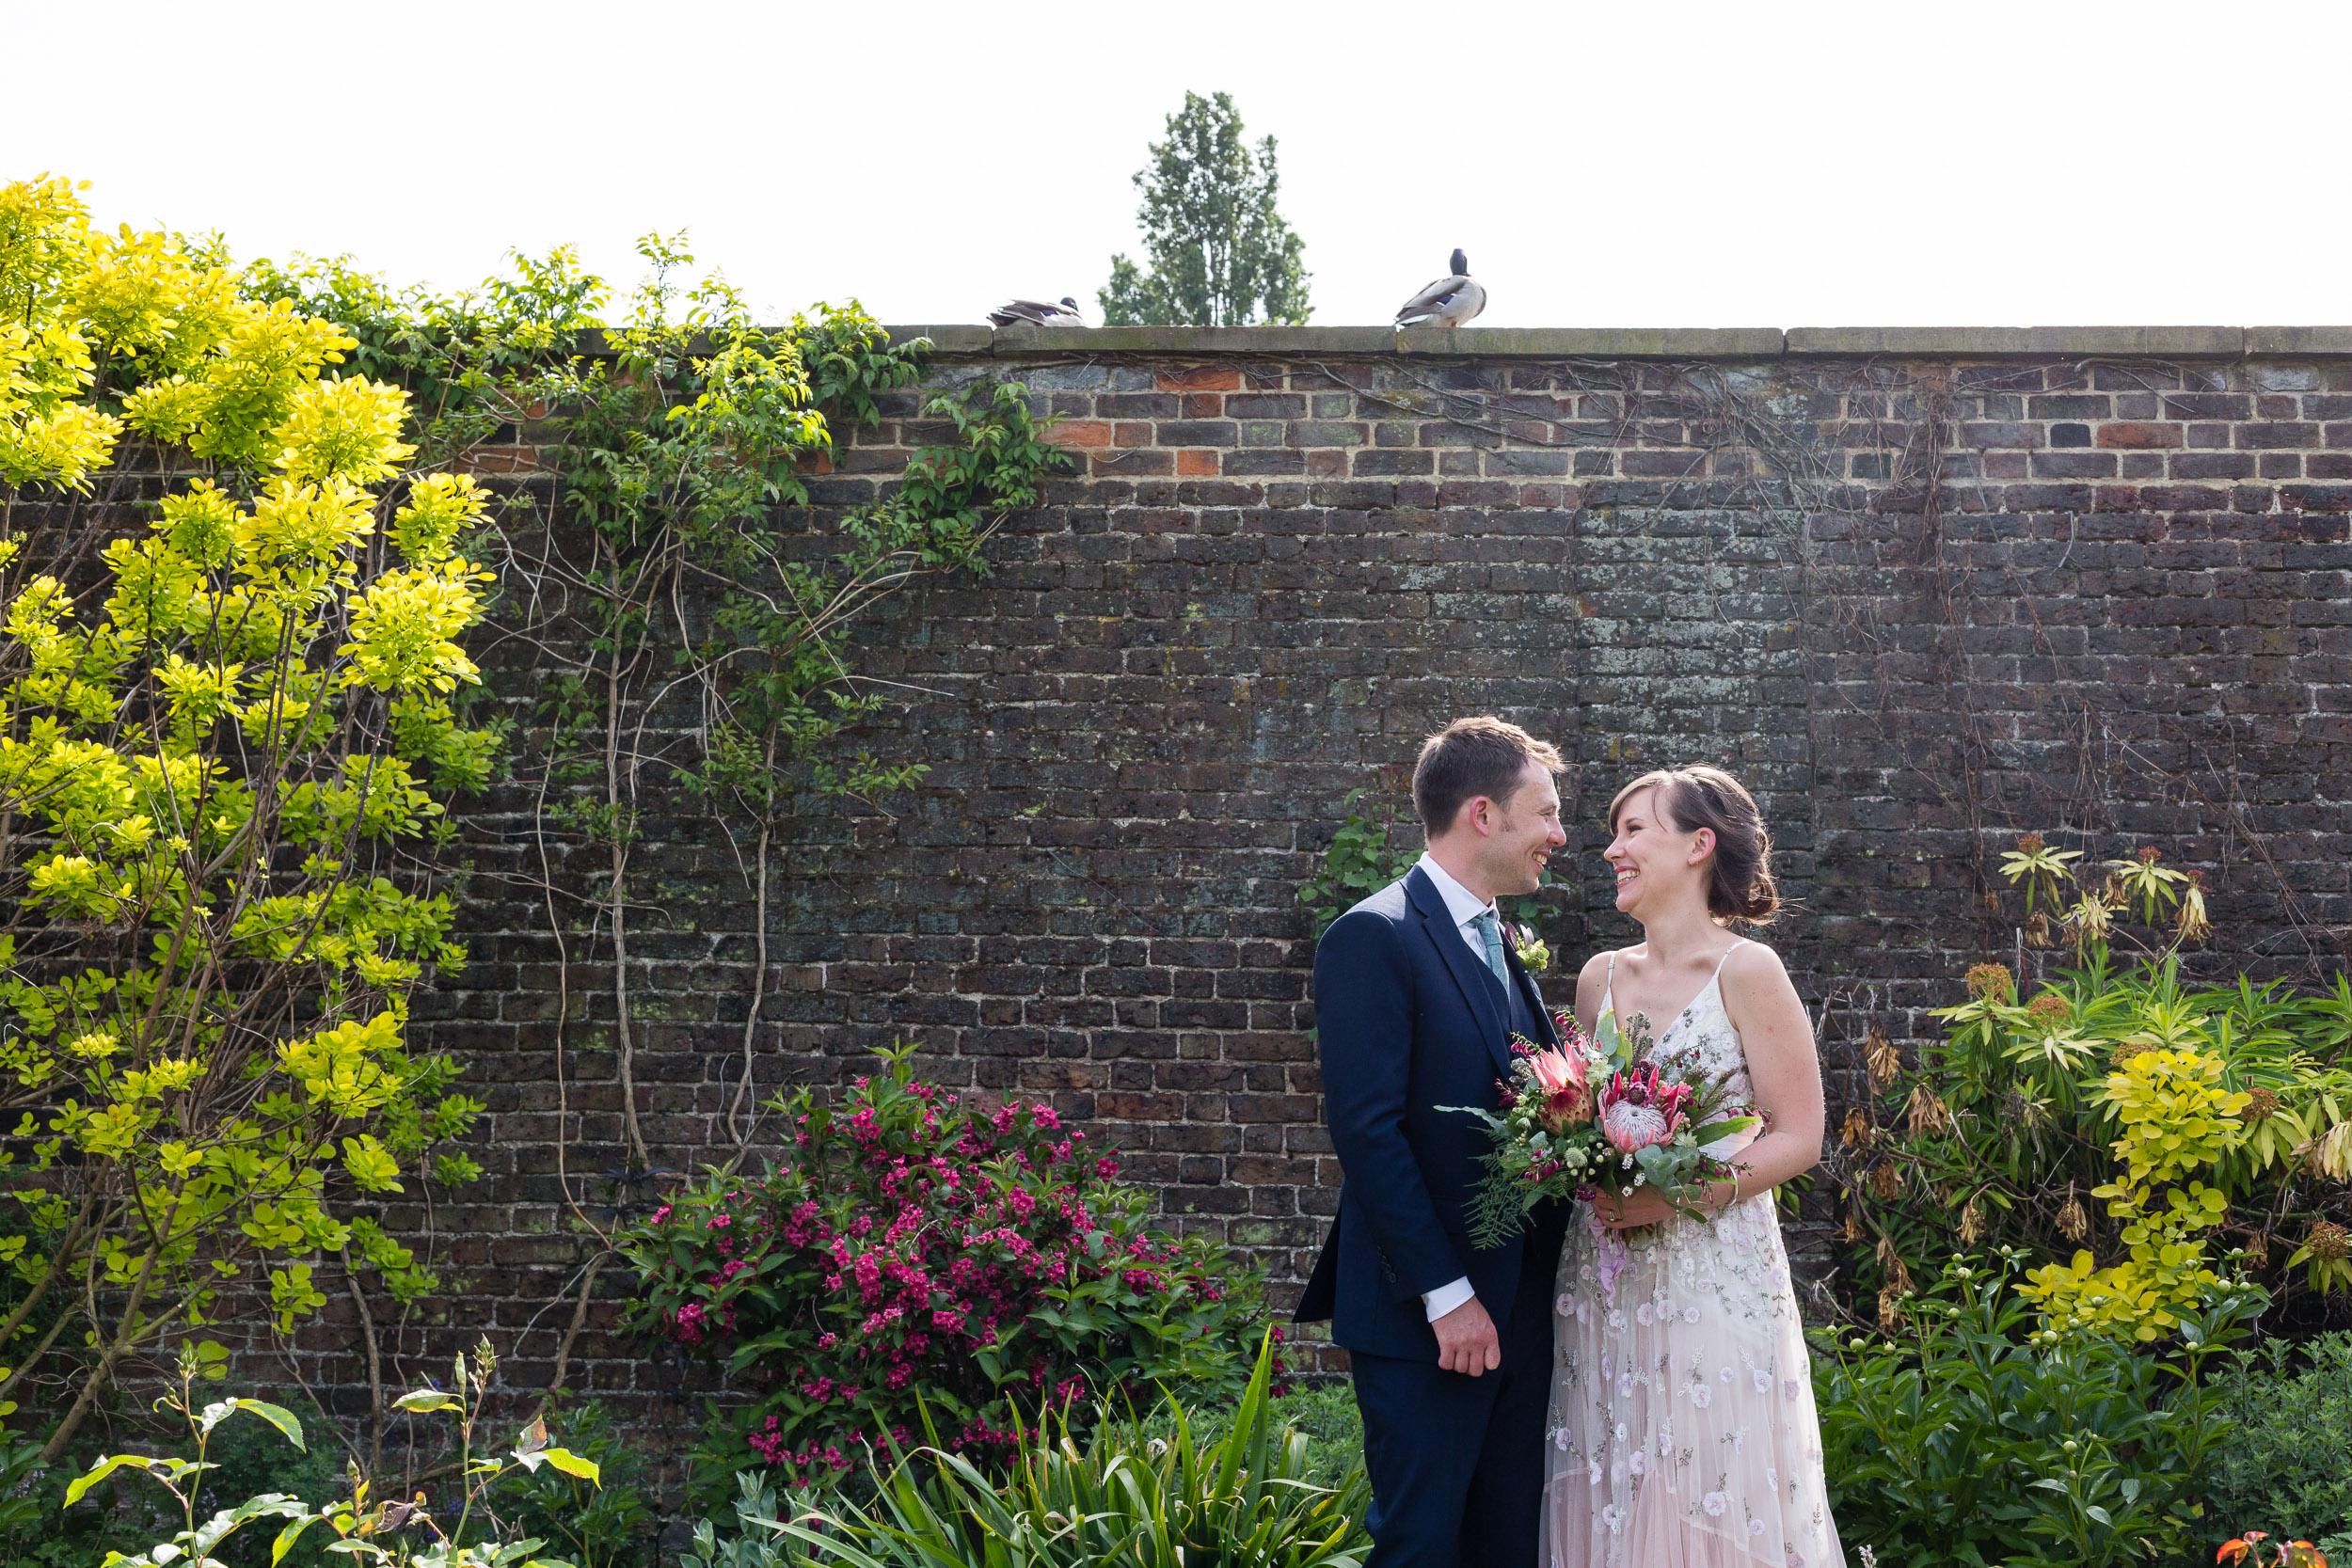 brockwell-lido-brixton-herne-hill-wedding-271.jpg